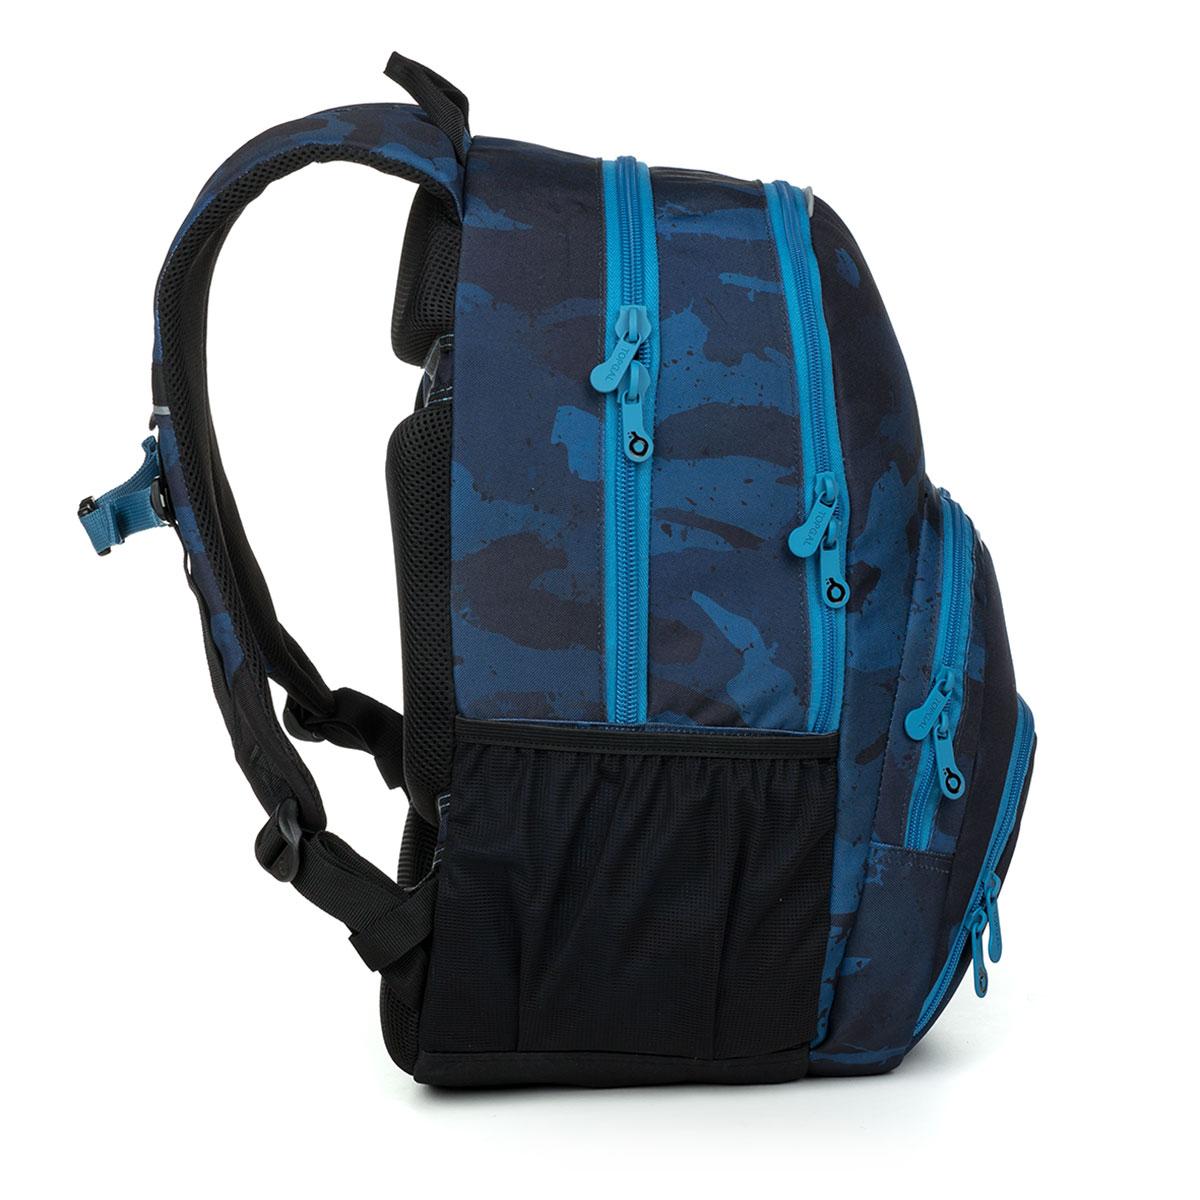 Studentský batoh Topgal SIAN 19032 B